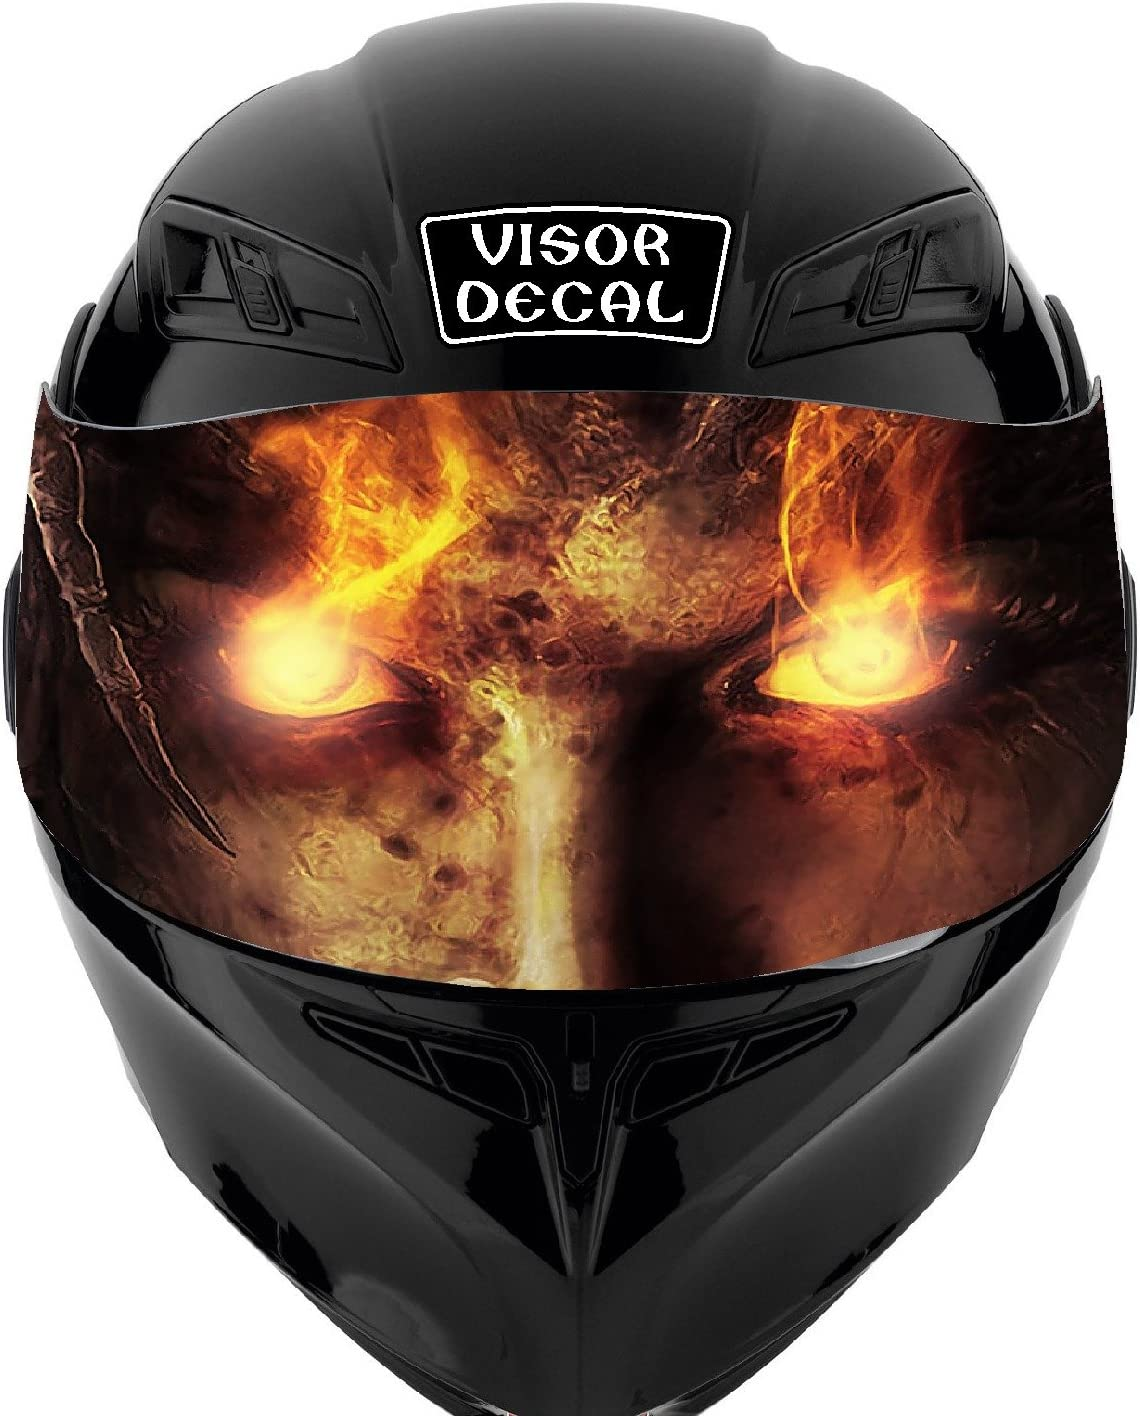 V40 Devil Demon VISOR TINT DECAL Raleigh Long Beach Mall Mall Graphic Fits: Helmet Sticker Ic